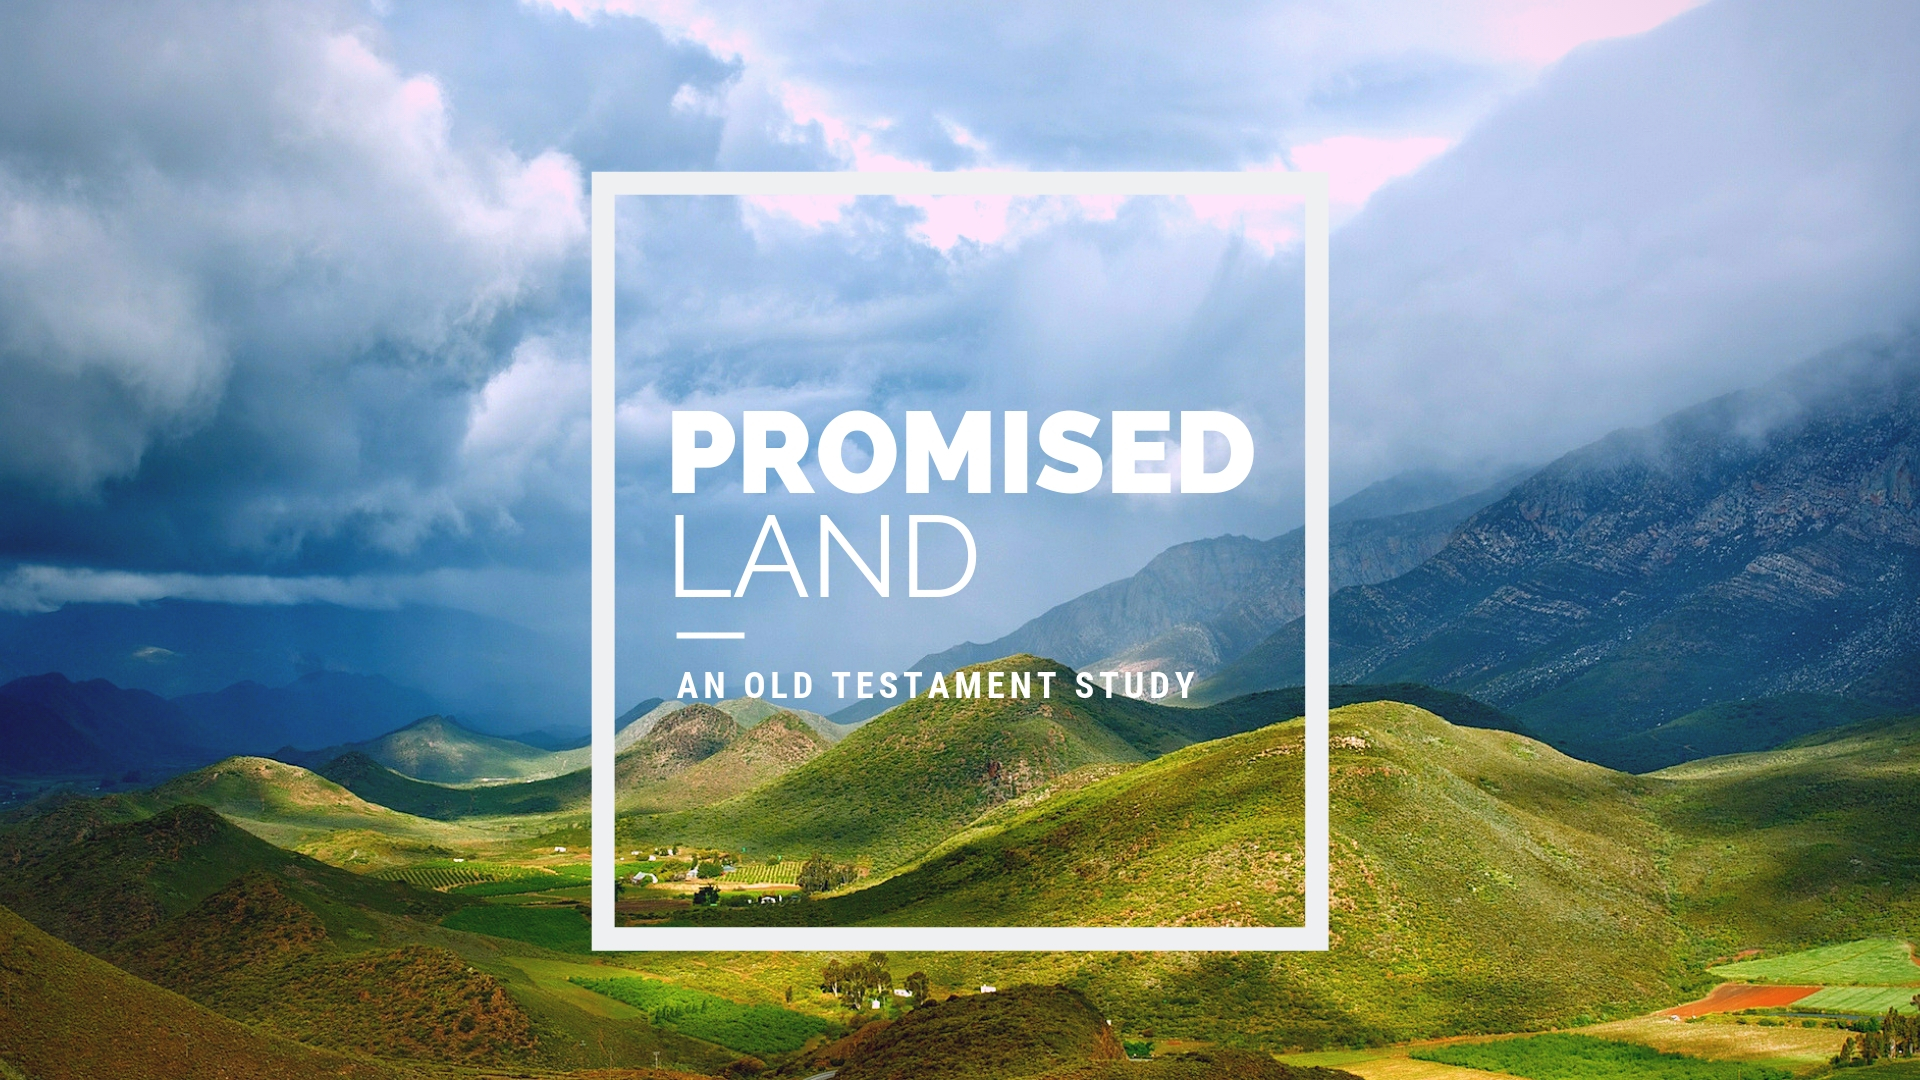 Copy of Promised Land Logo.jpg